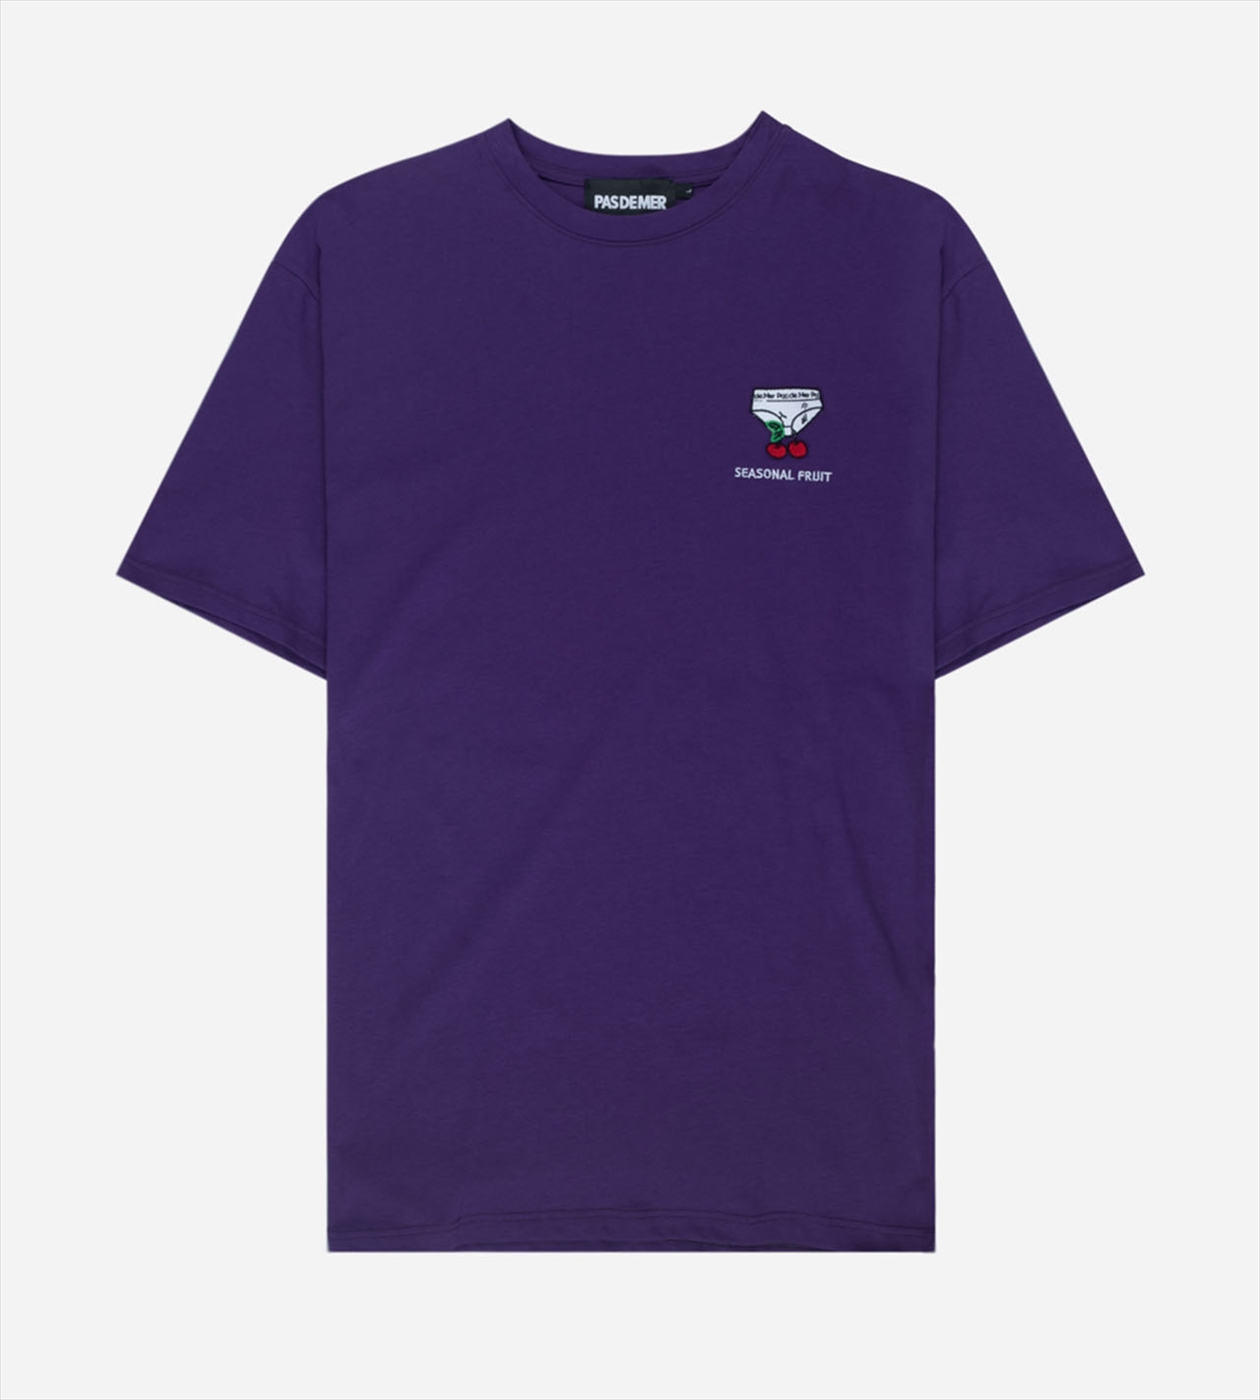 【PAS DE MER/パドゥメ】SEASONAL T-SHIRT Tシャツ / PURPLE